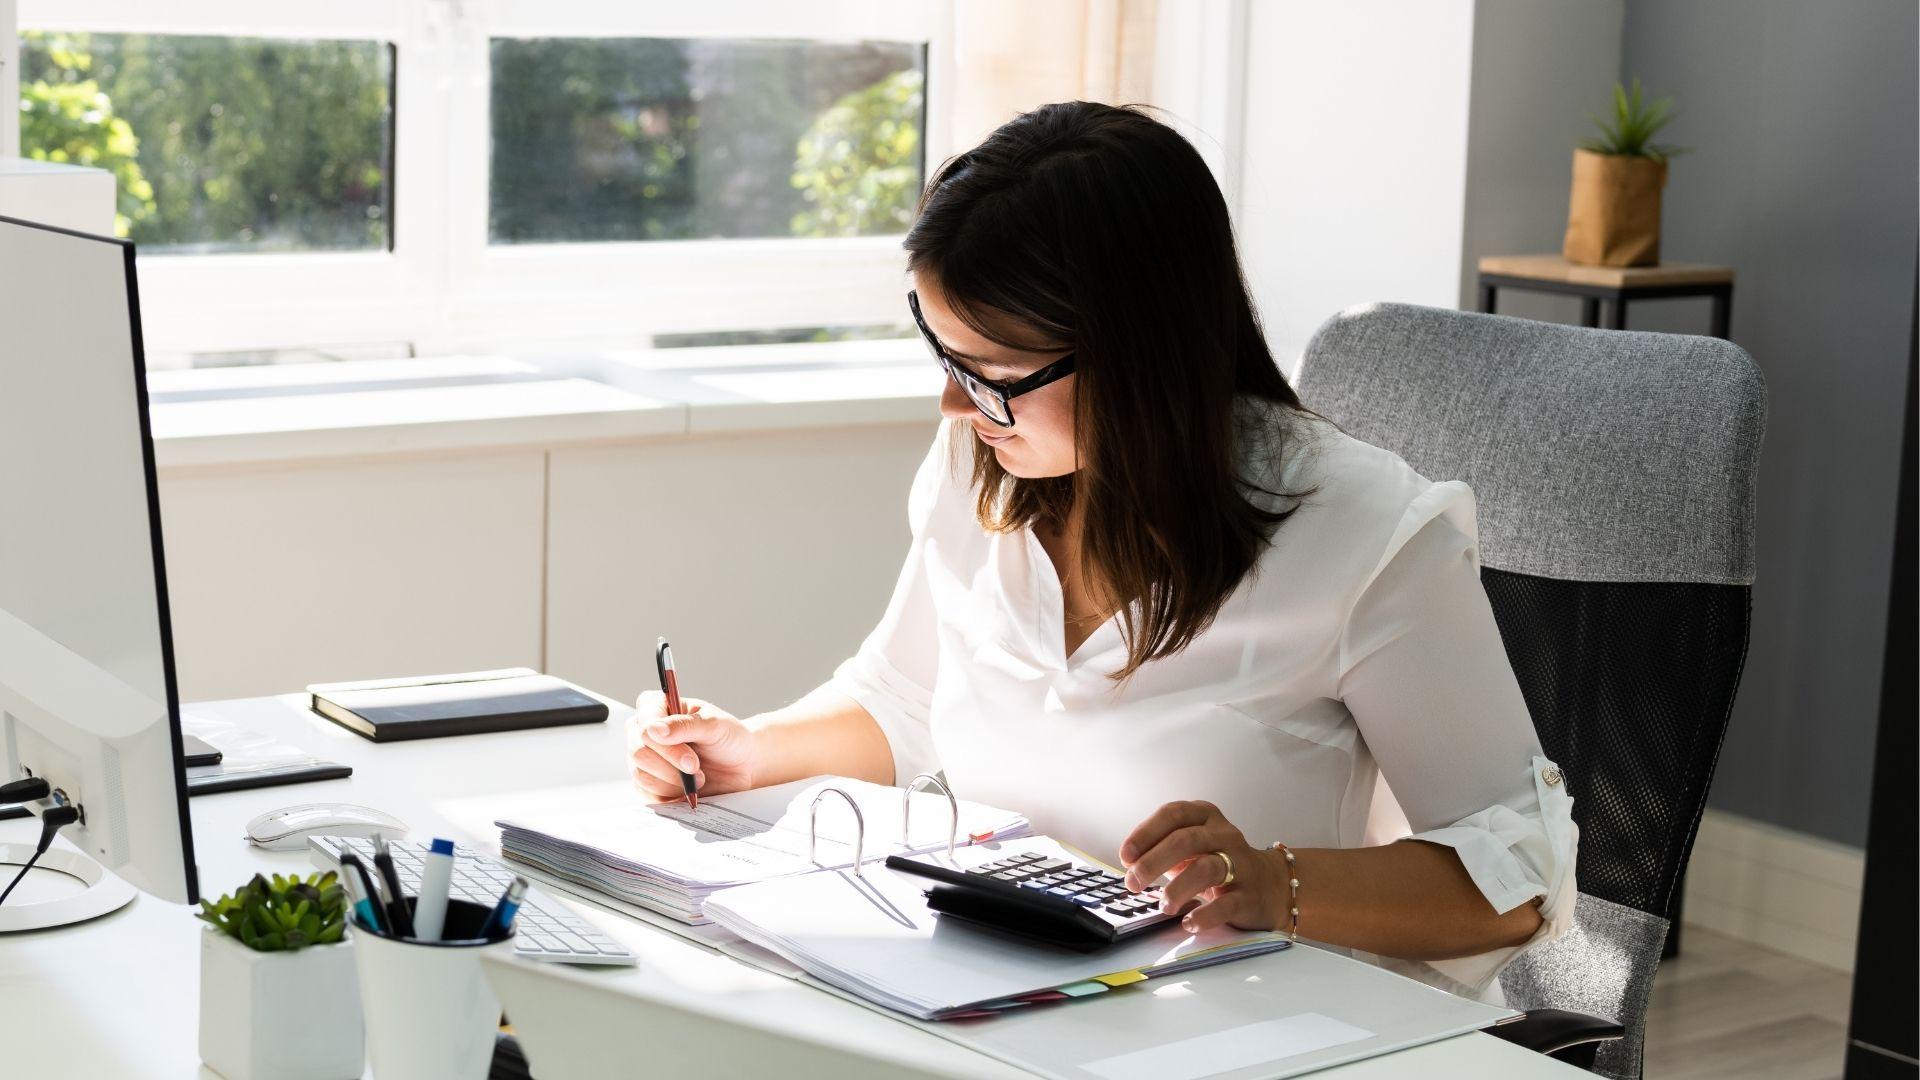 accounts clerk desk calculator pen folder